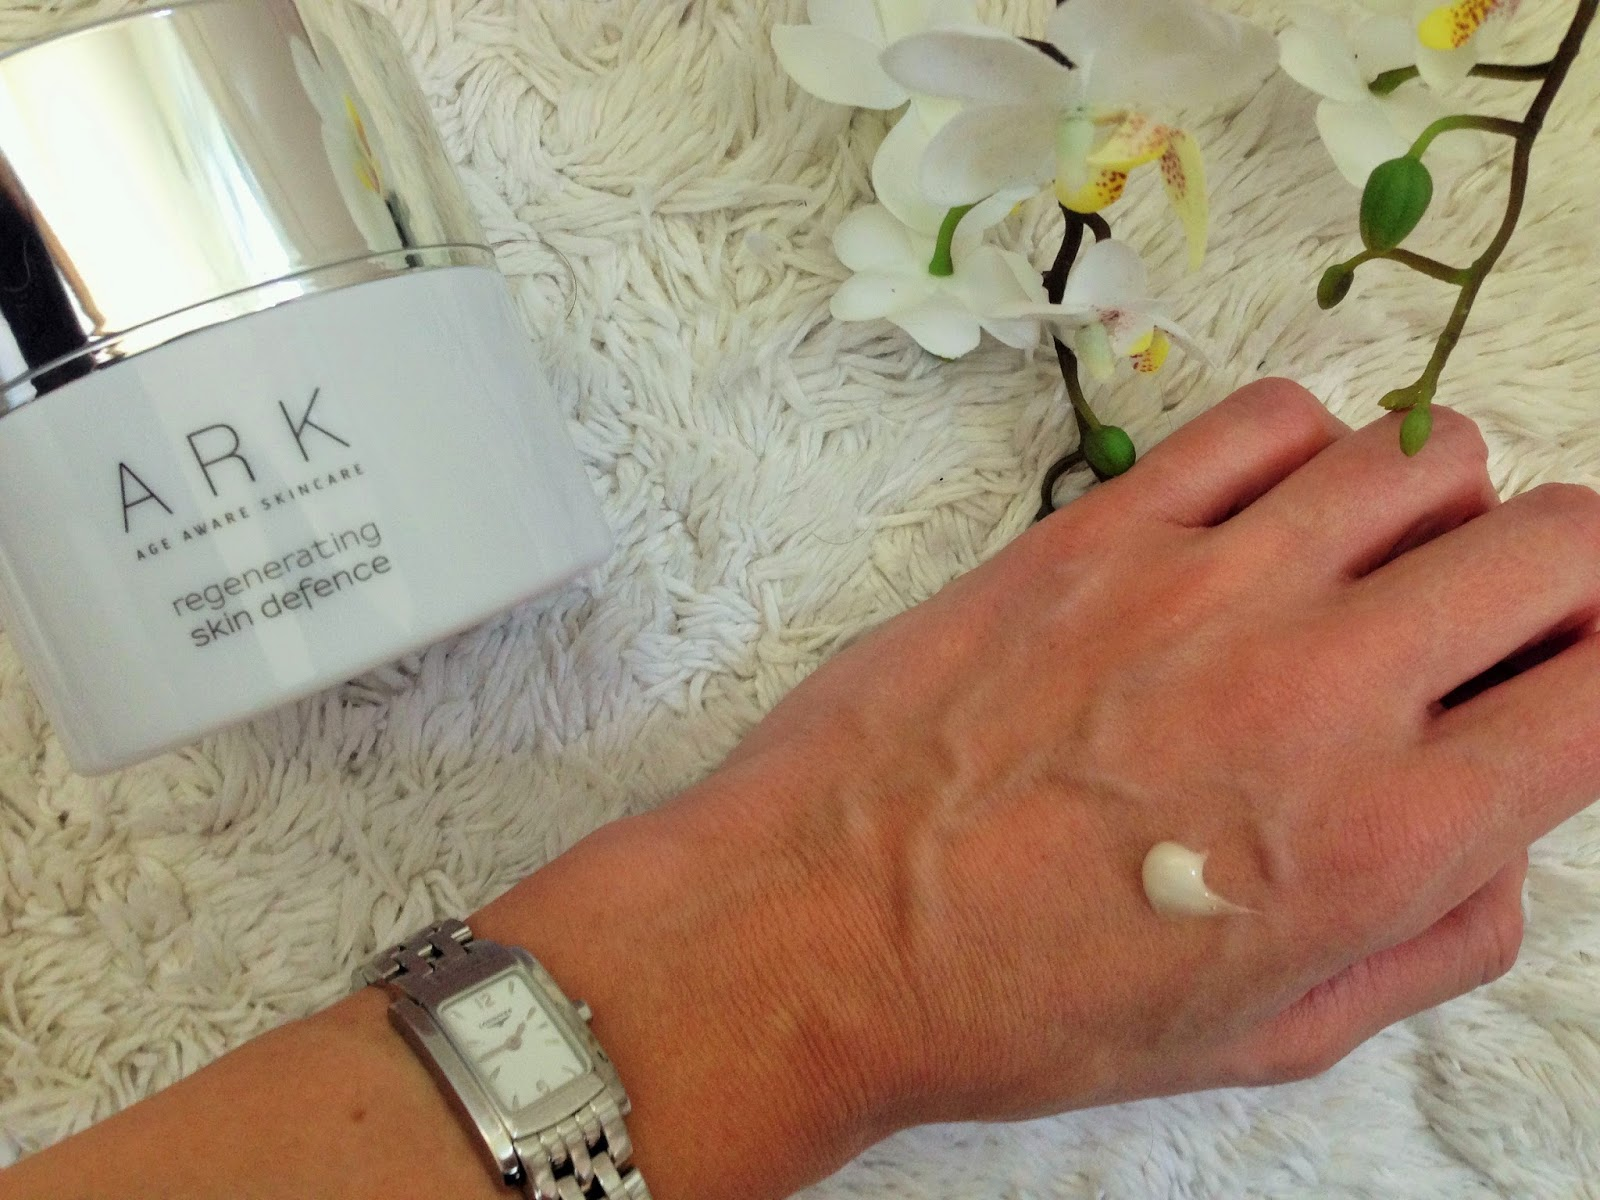 Ark Skincare Regenerating Skin Defence